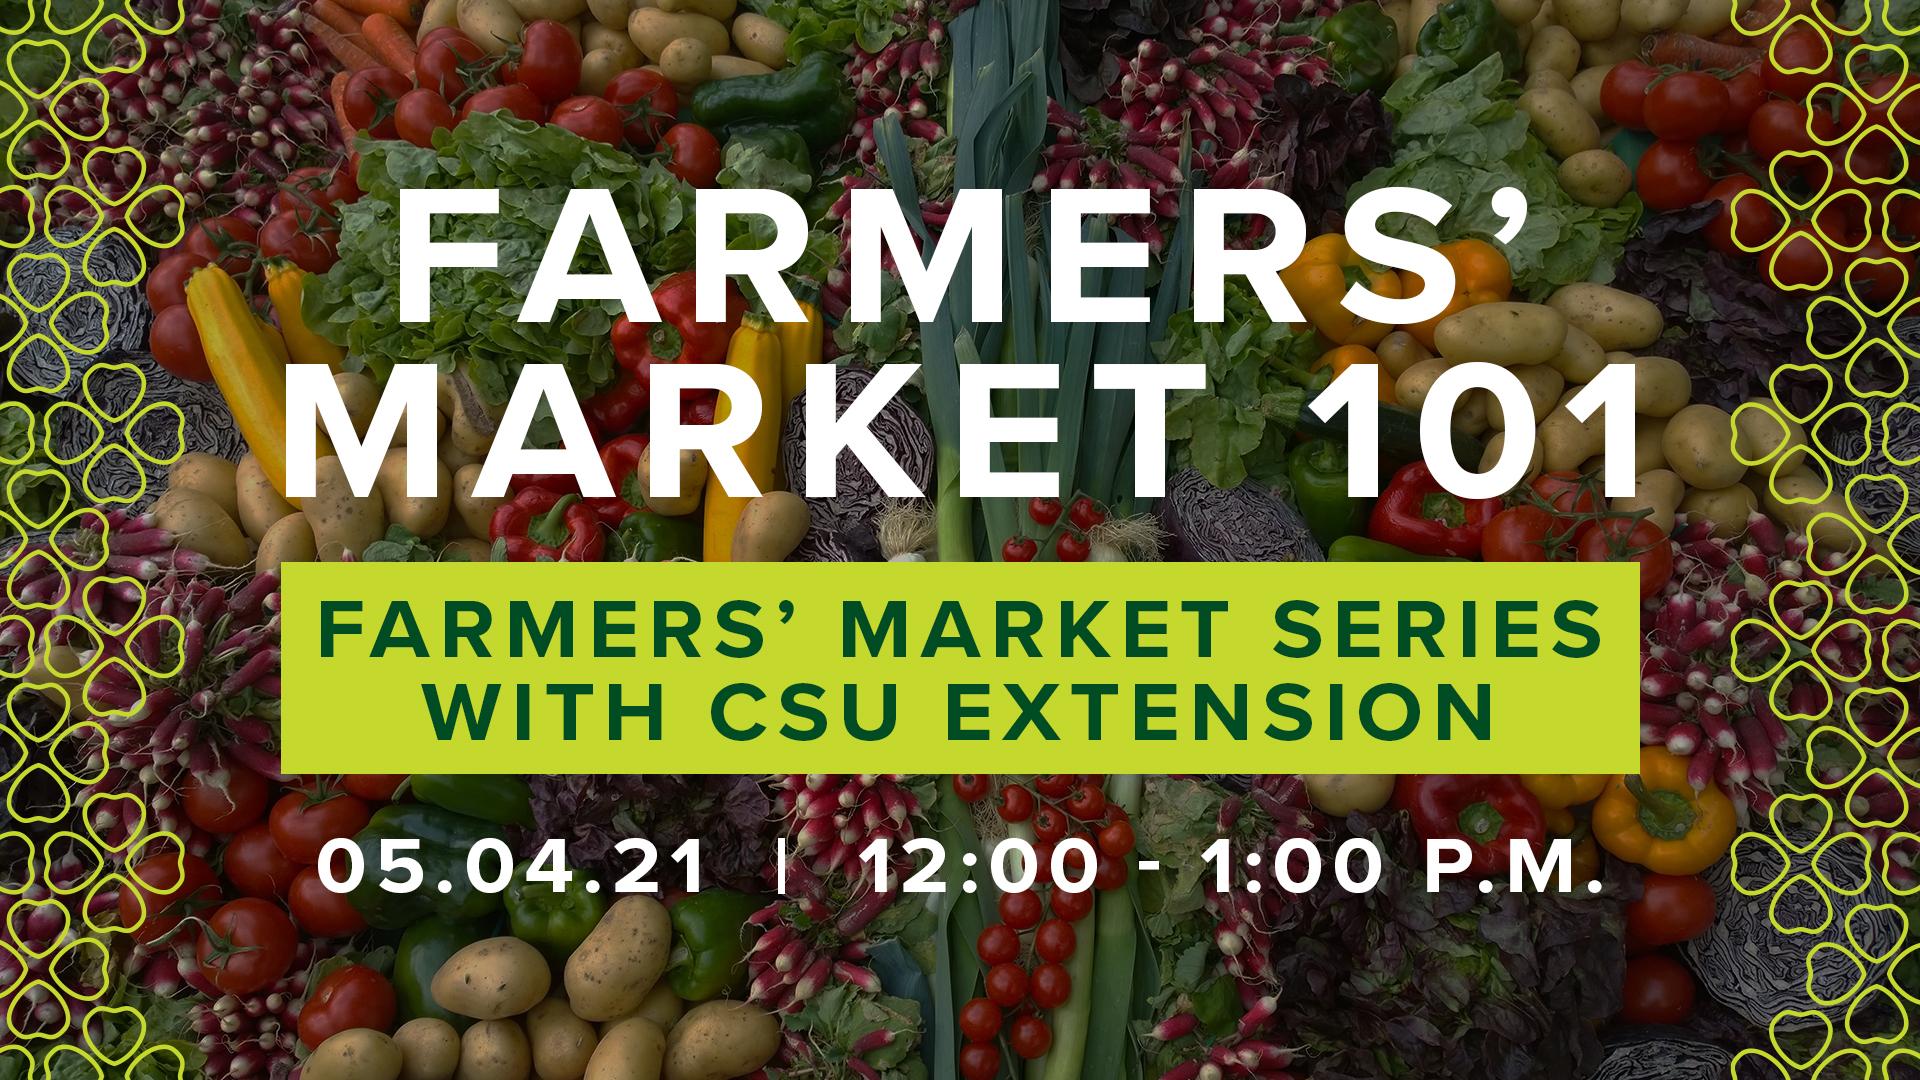 Image for Farmer's Market Series with CSU Extension: Farmer's Market 101 webinar